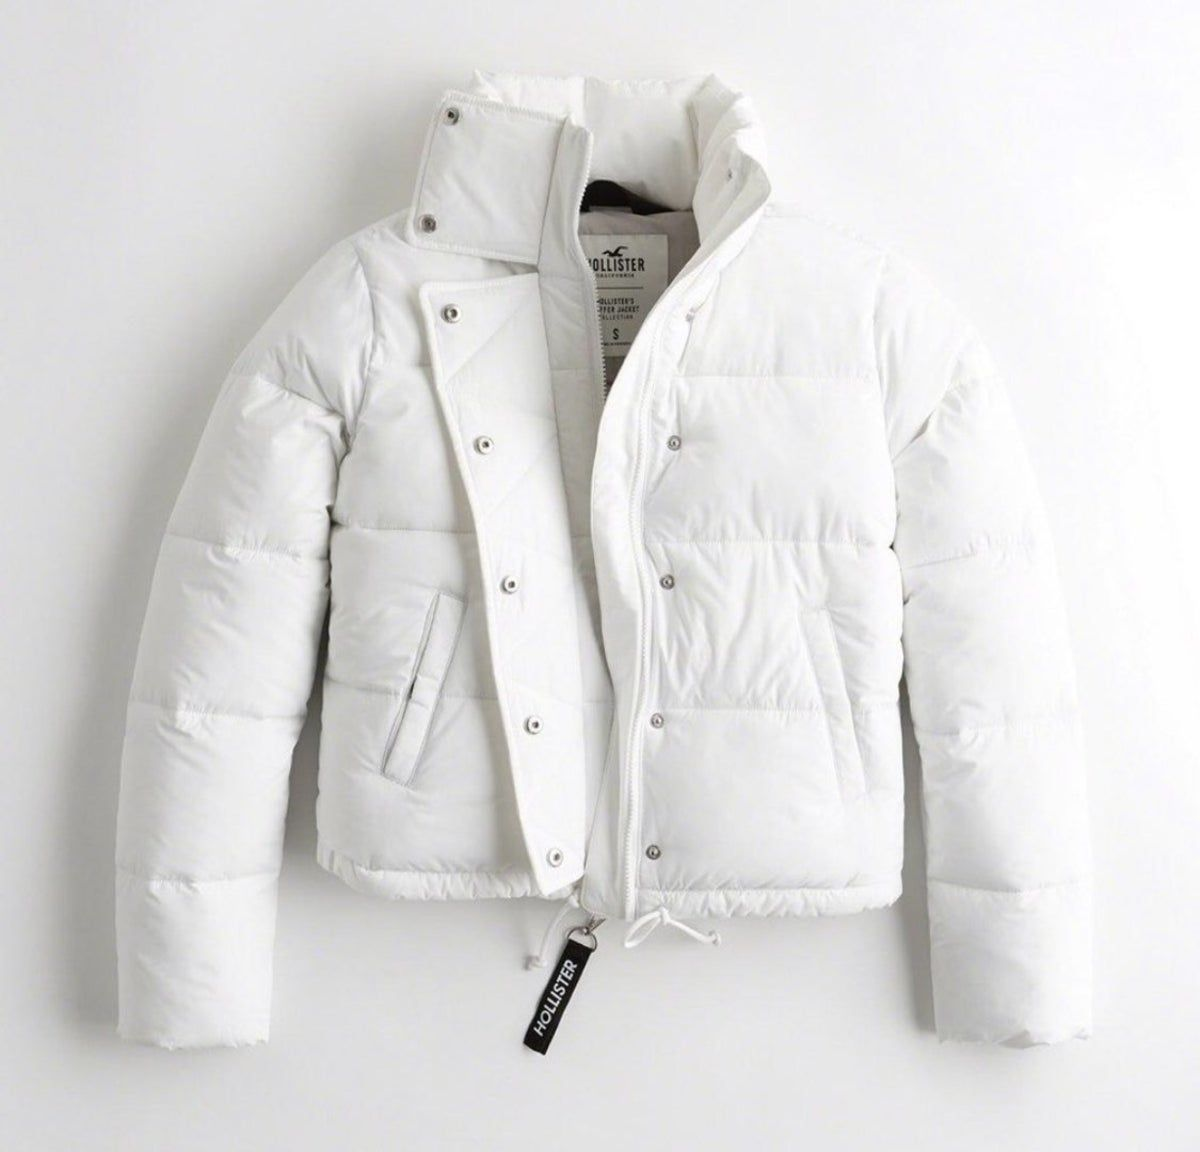 White Mock Neck Puffer Jacket Puffer Jacket Outfit Jackets White Puffer Jacket Outfit [ 1152 x 1200 Pixel ]